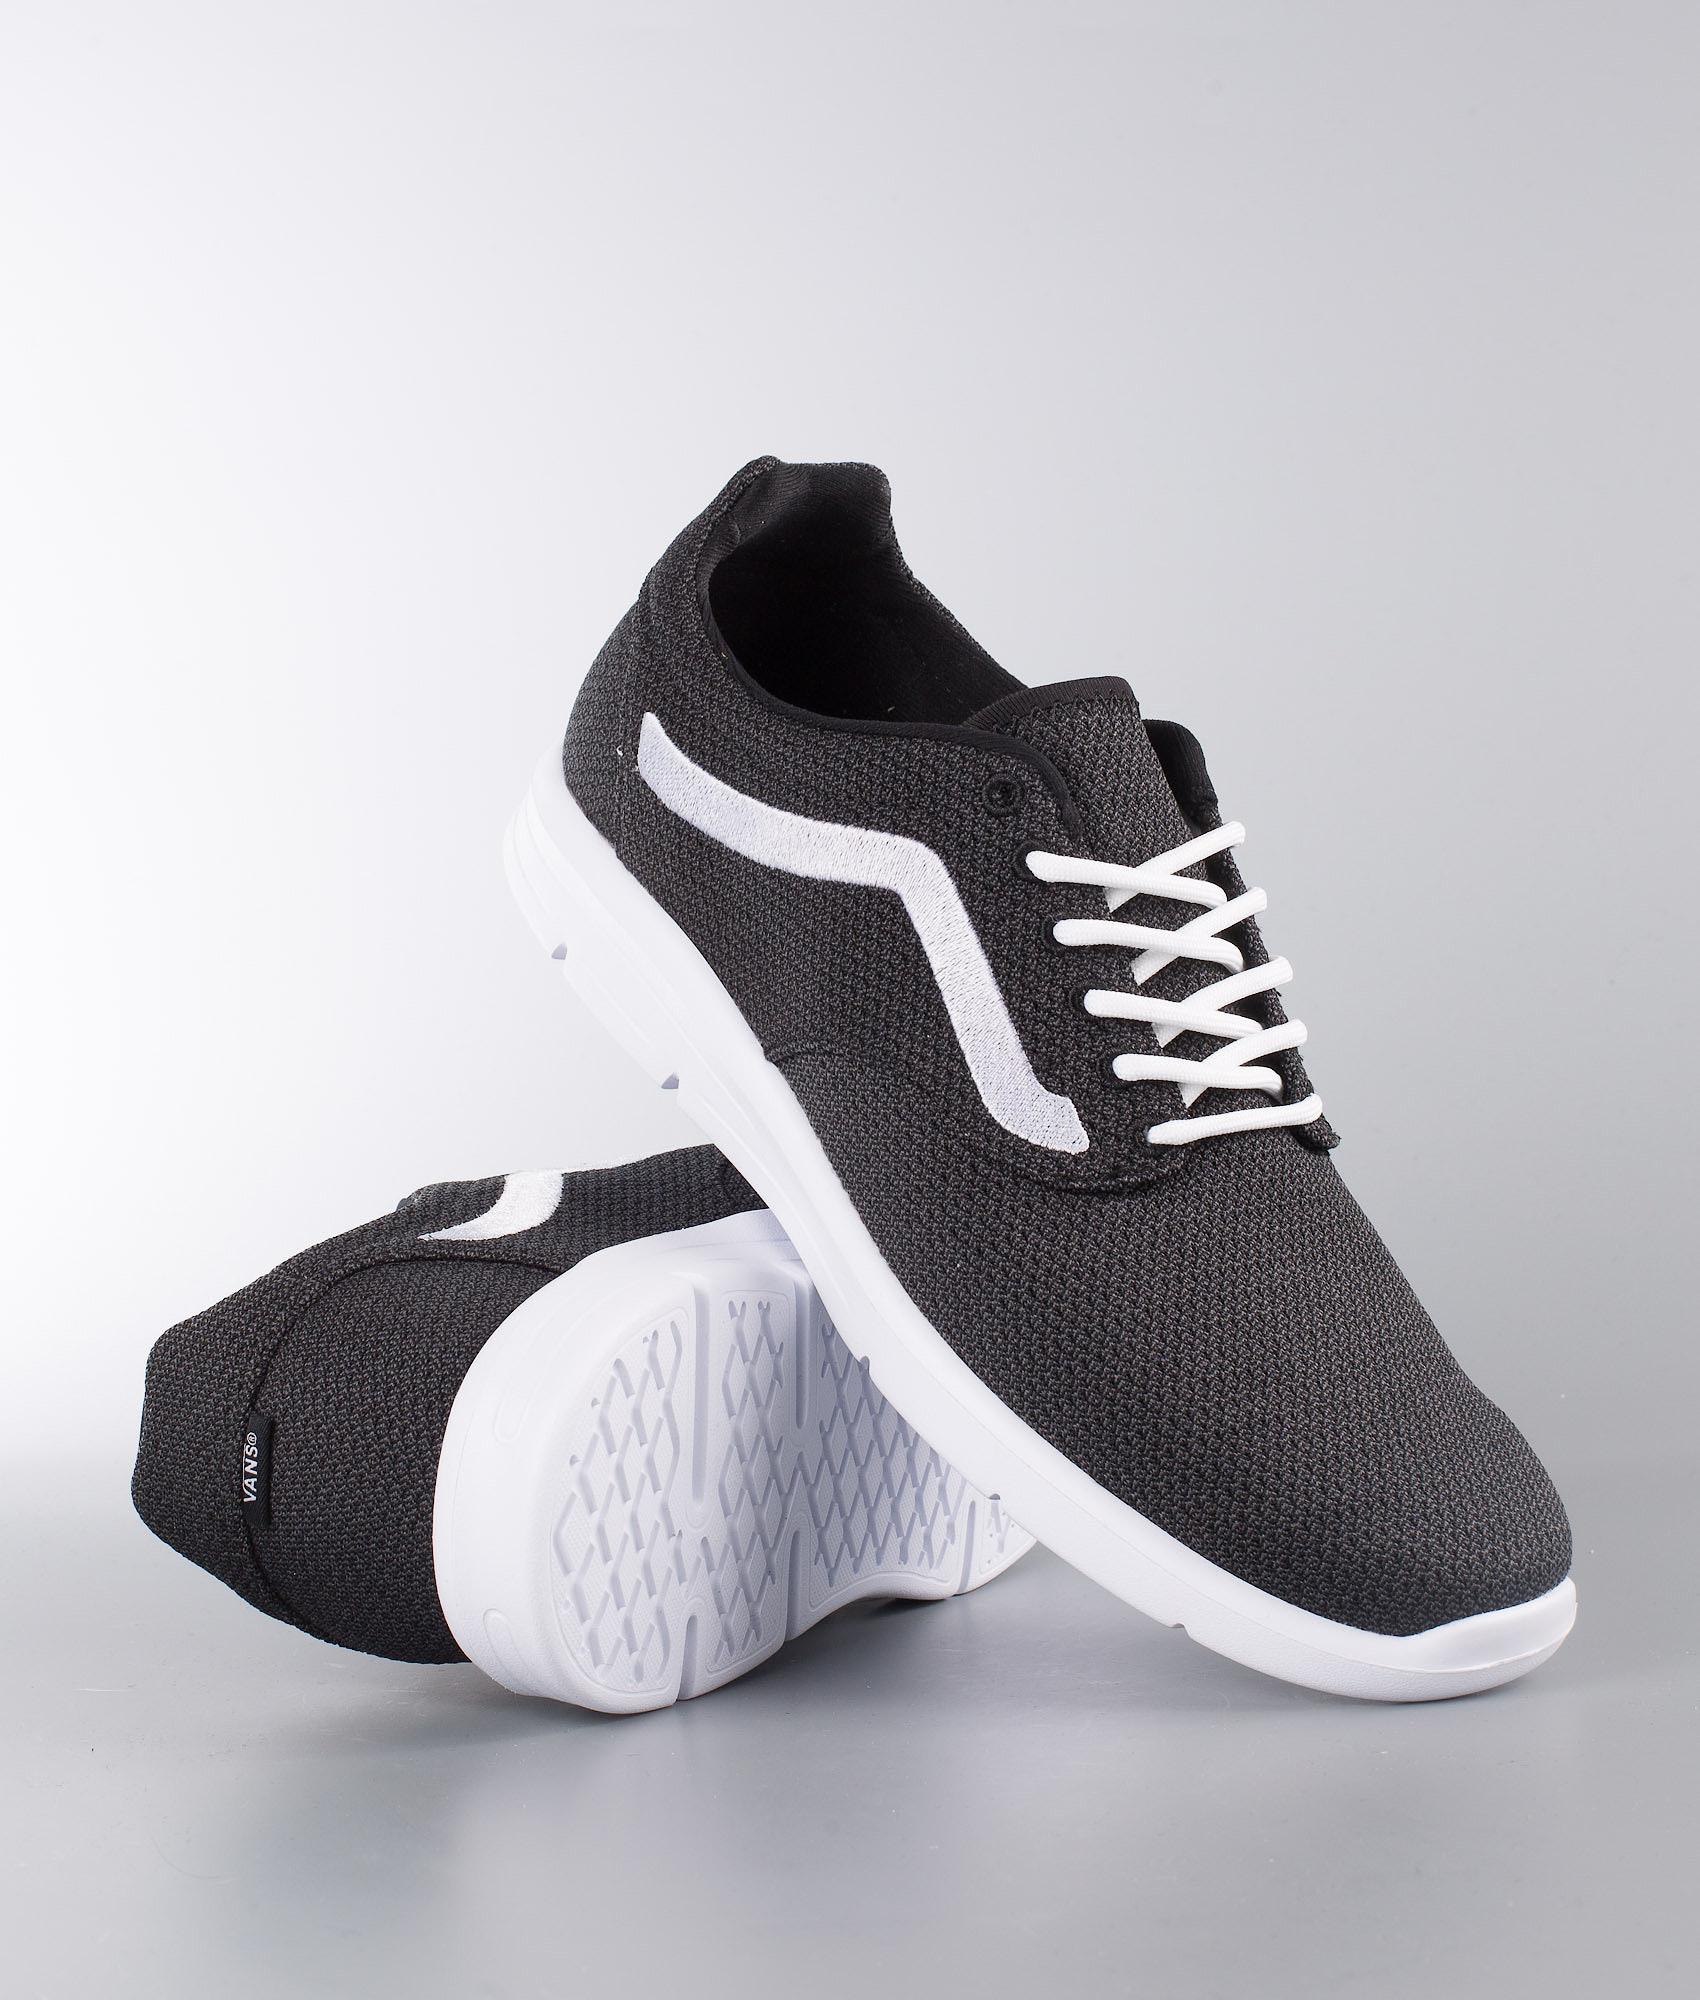 5ee1f78655a0 Vans Iso 1.5 Shoes (Mesh) Black Asphalt True White - Ridestore.com